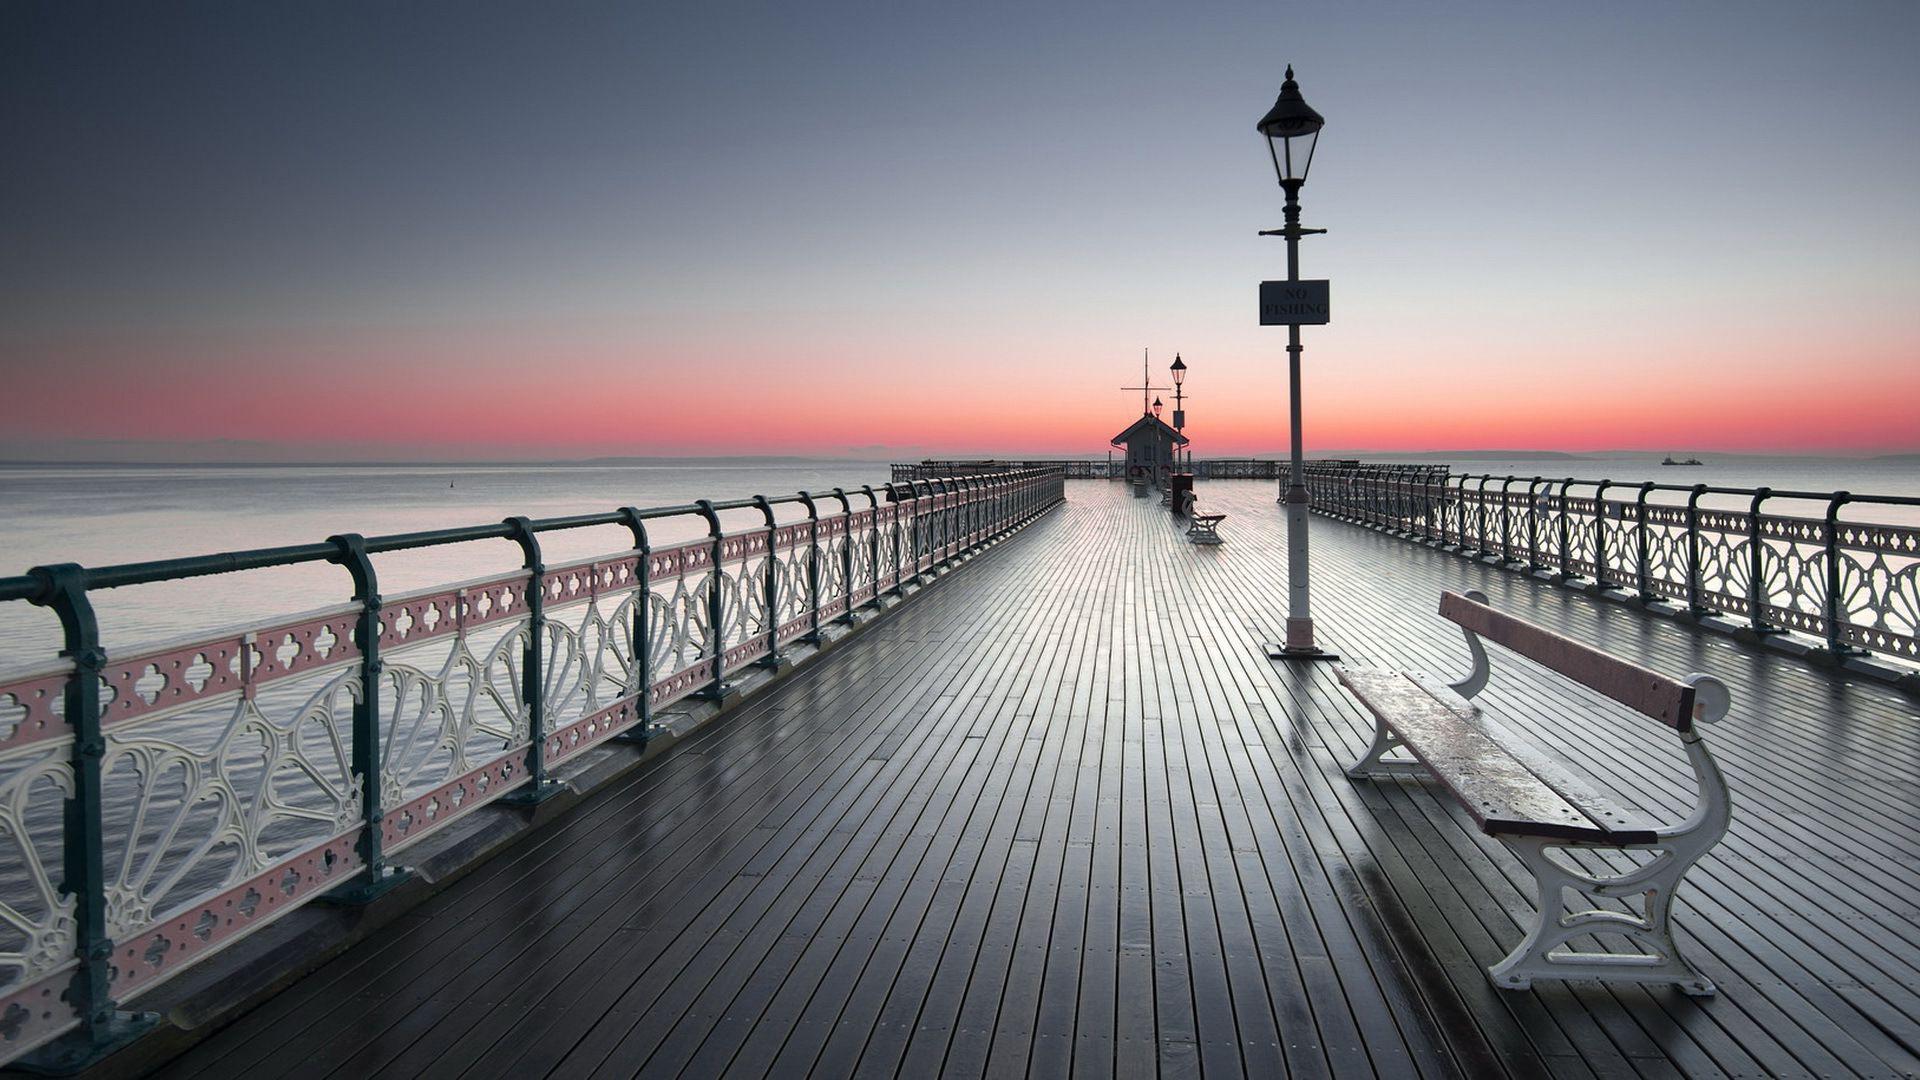 Pier HD wallpapers, Desktop wallpaper - most viewed